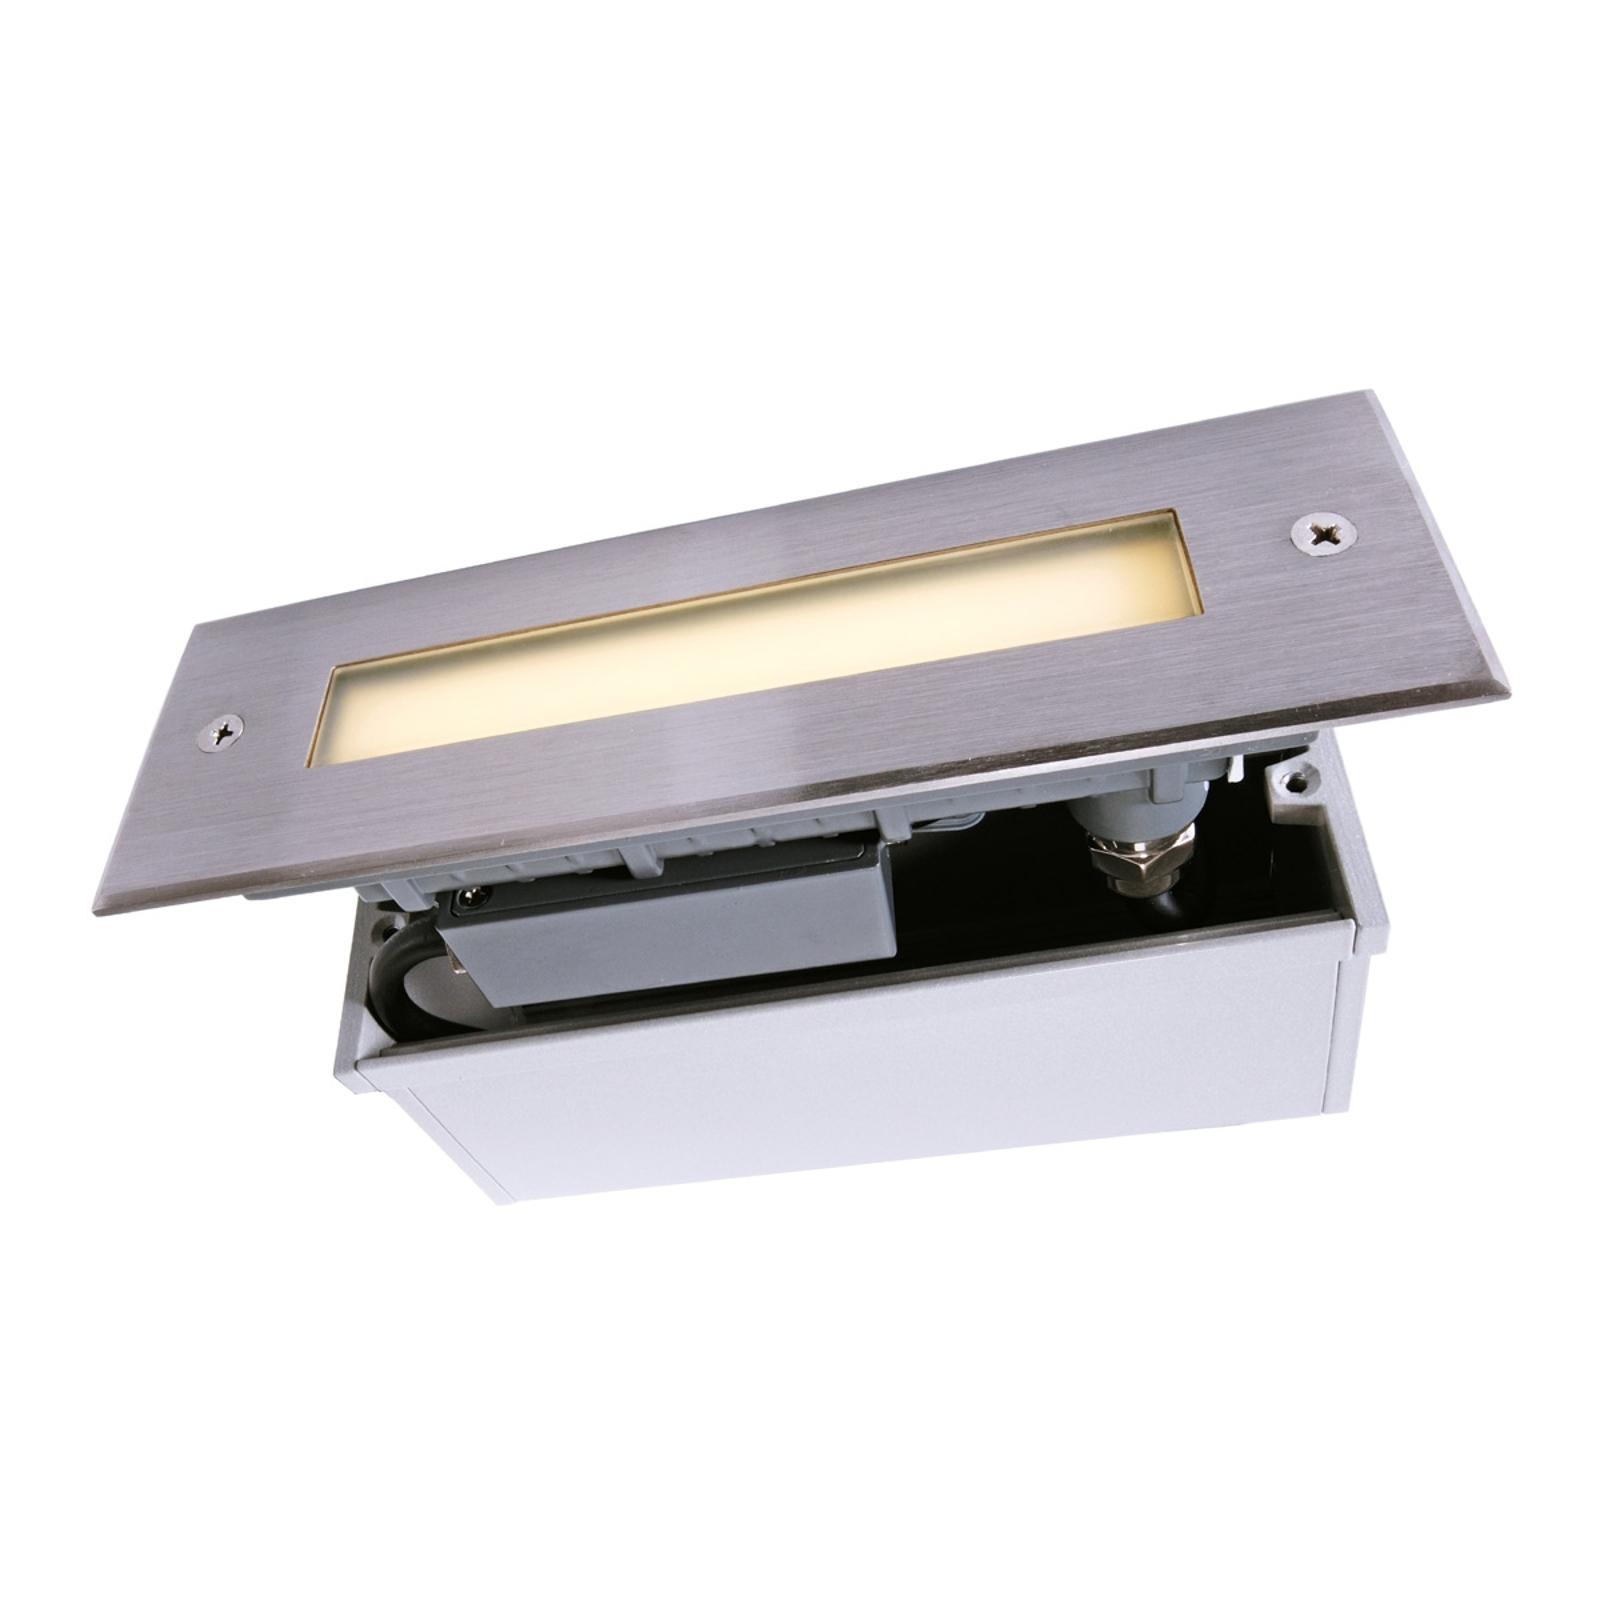 LED-golvinbyggnadslampa Line, längd 18,3 cm